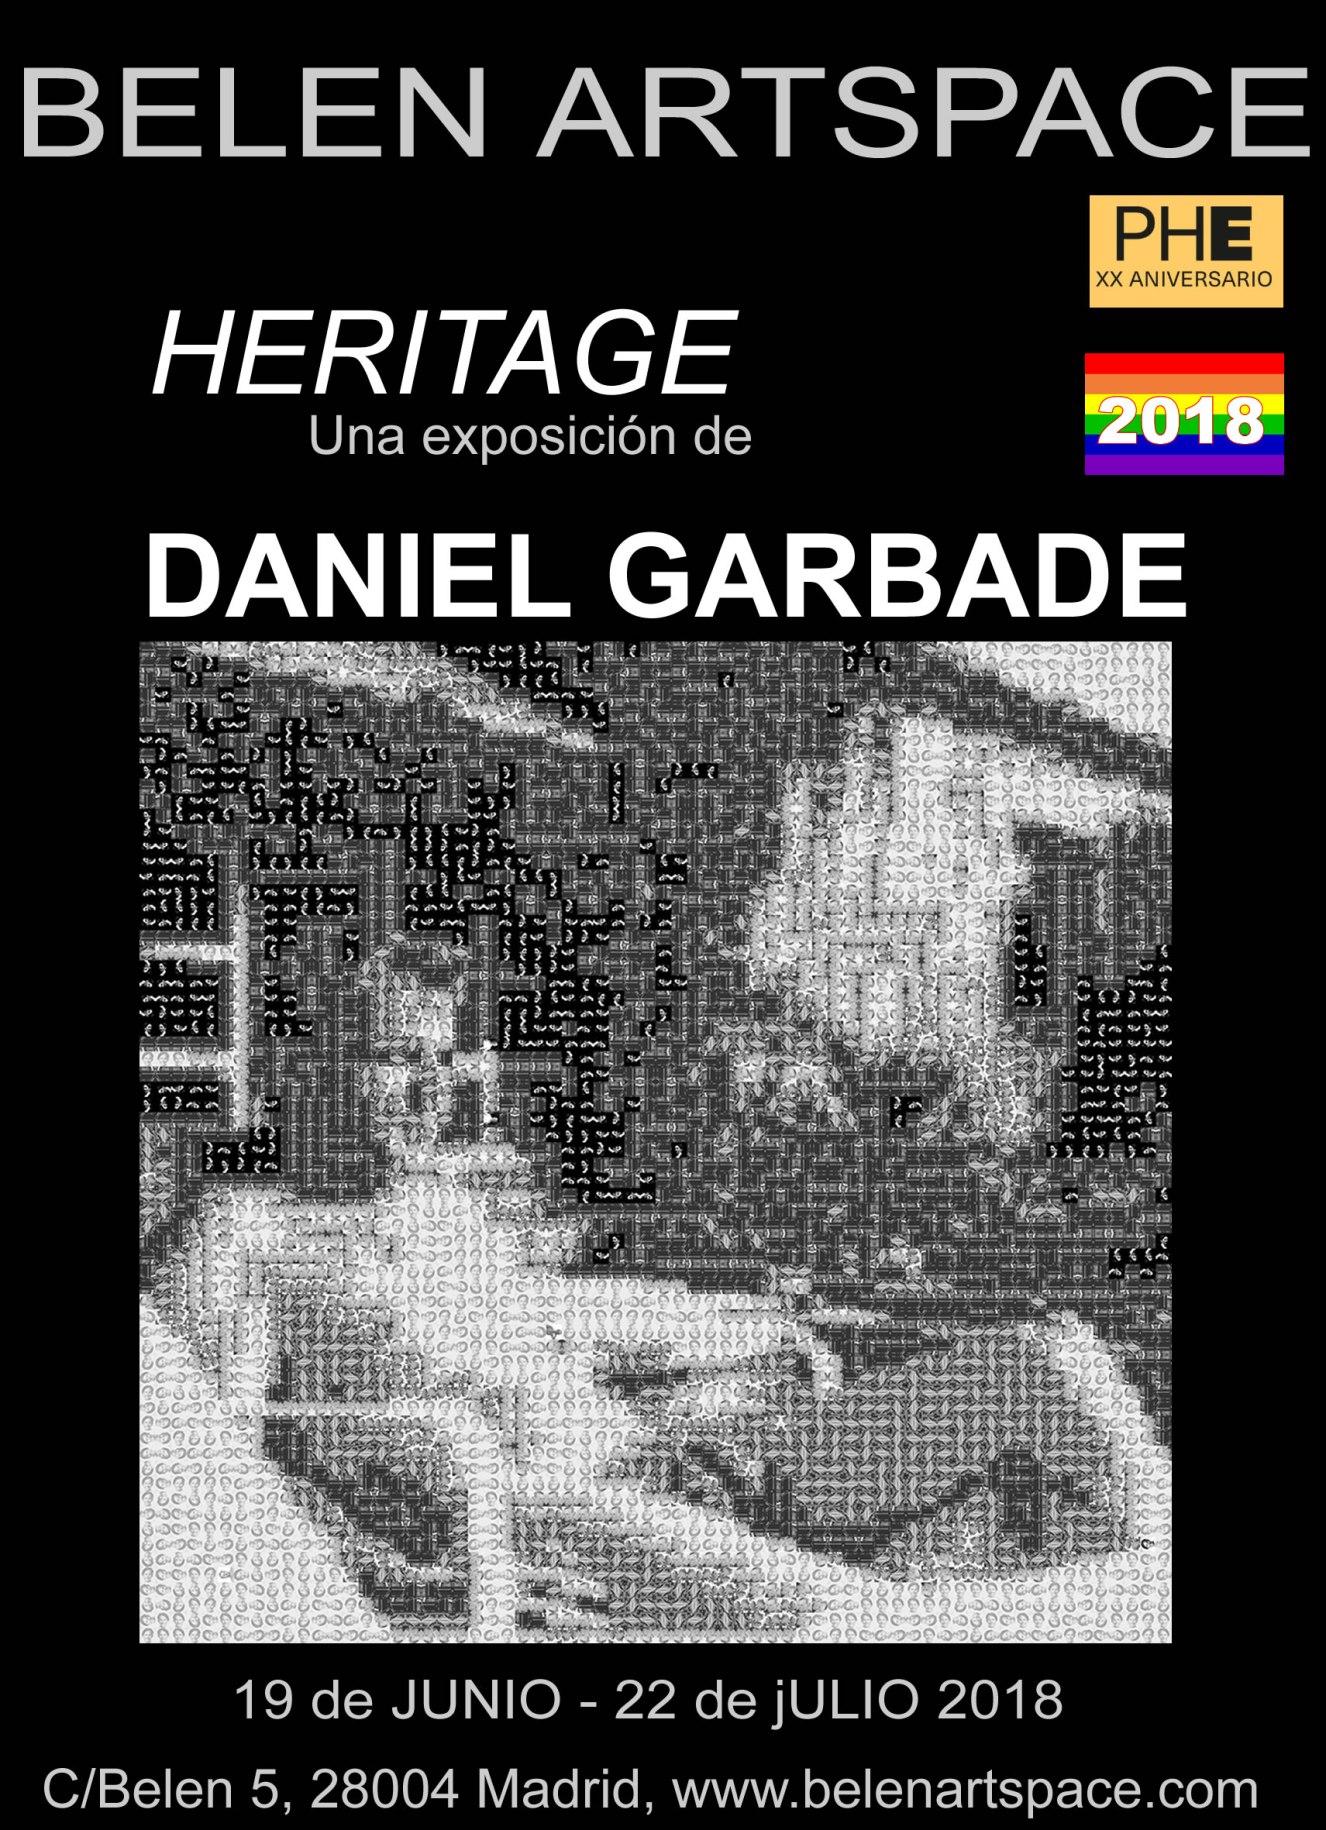 Photo España,heritage,Daniel,Garbade,Belen Artspace,Cartell, orgullo 2018,belen artspace,